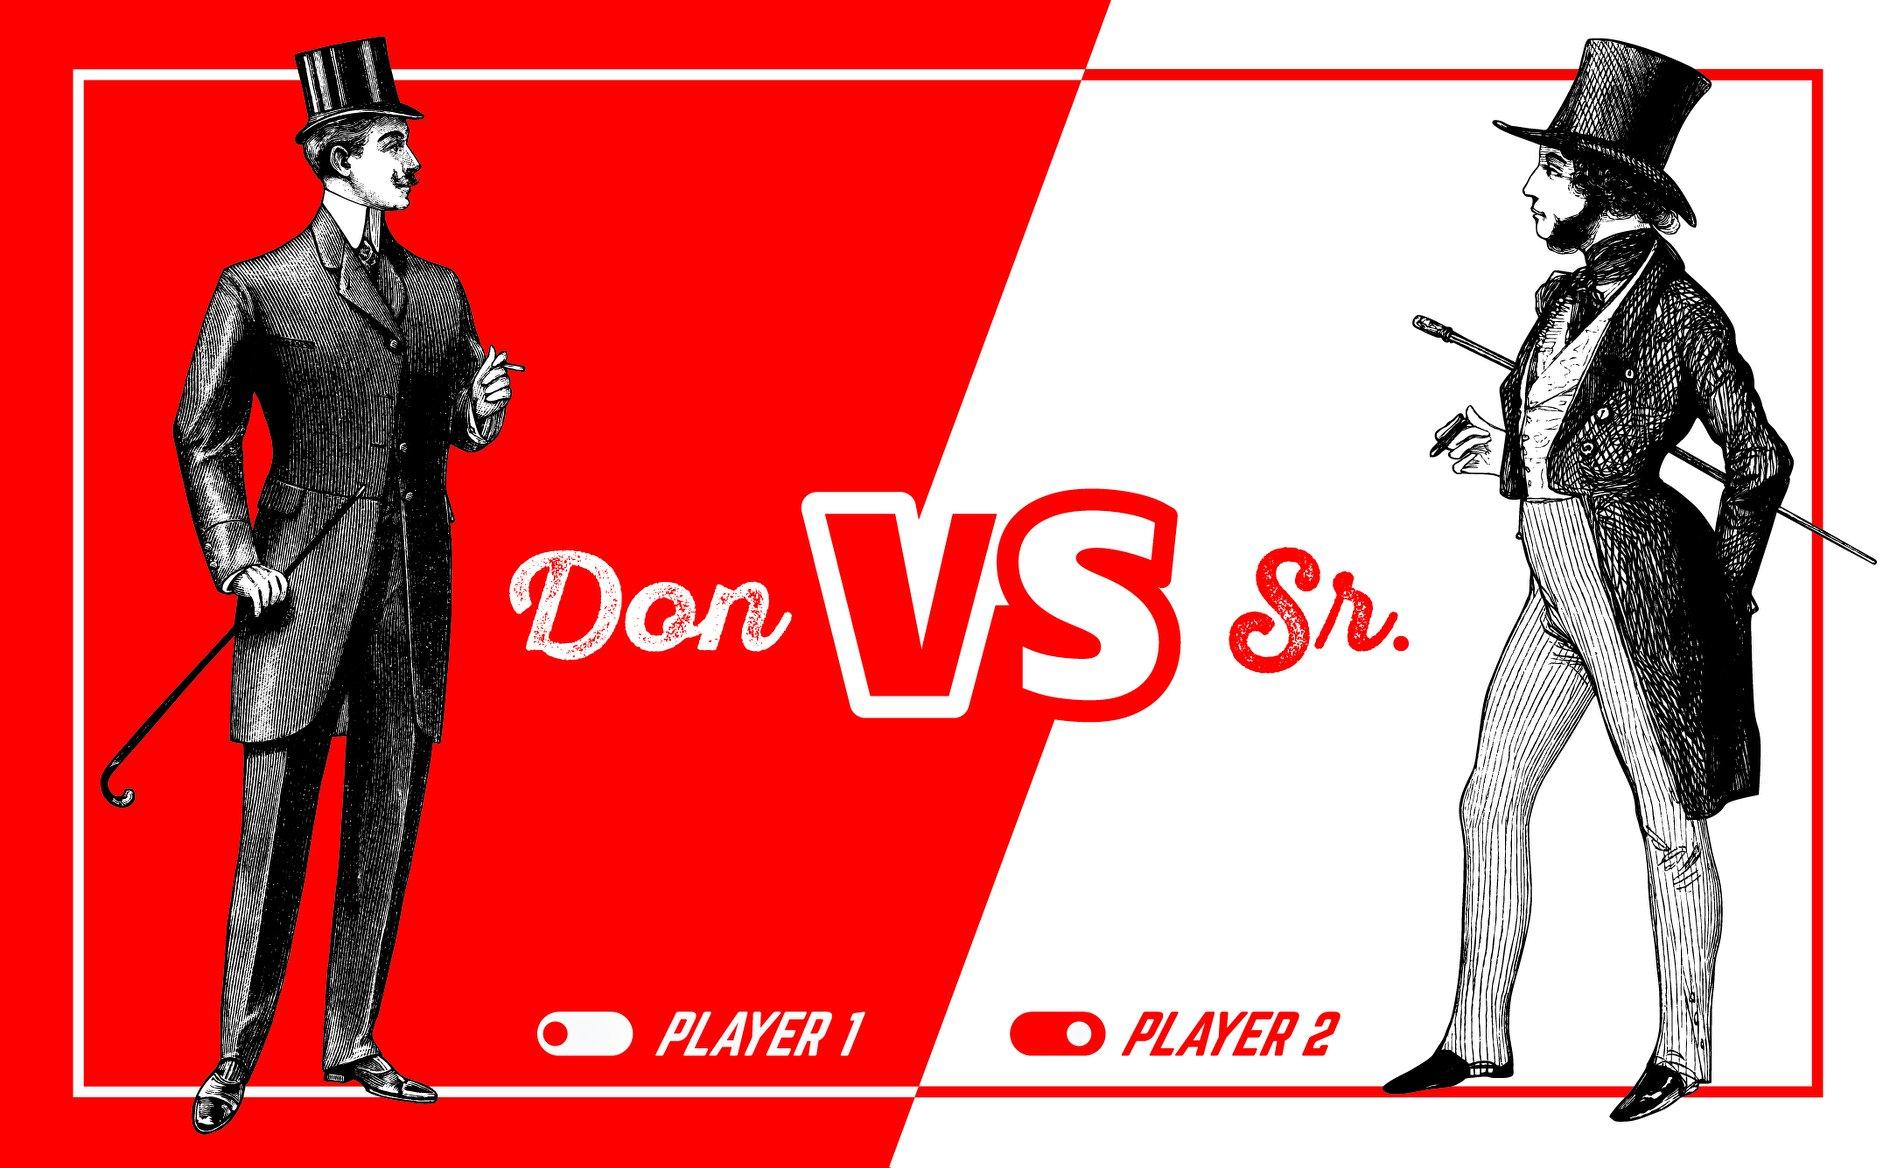 Imagen de la noticia Don vs. Sr.